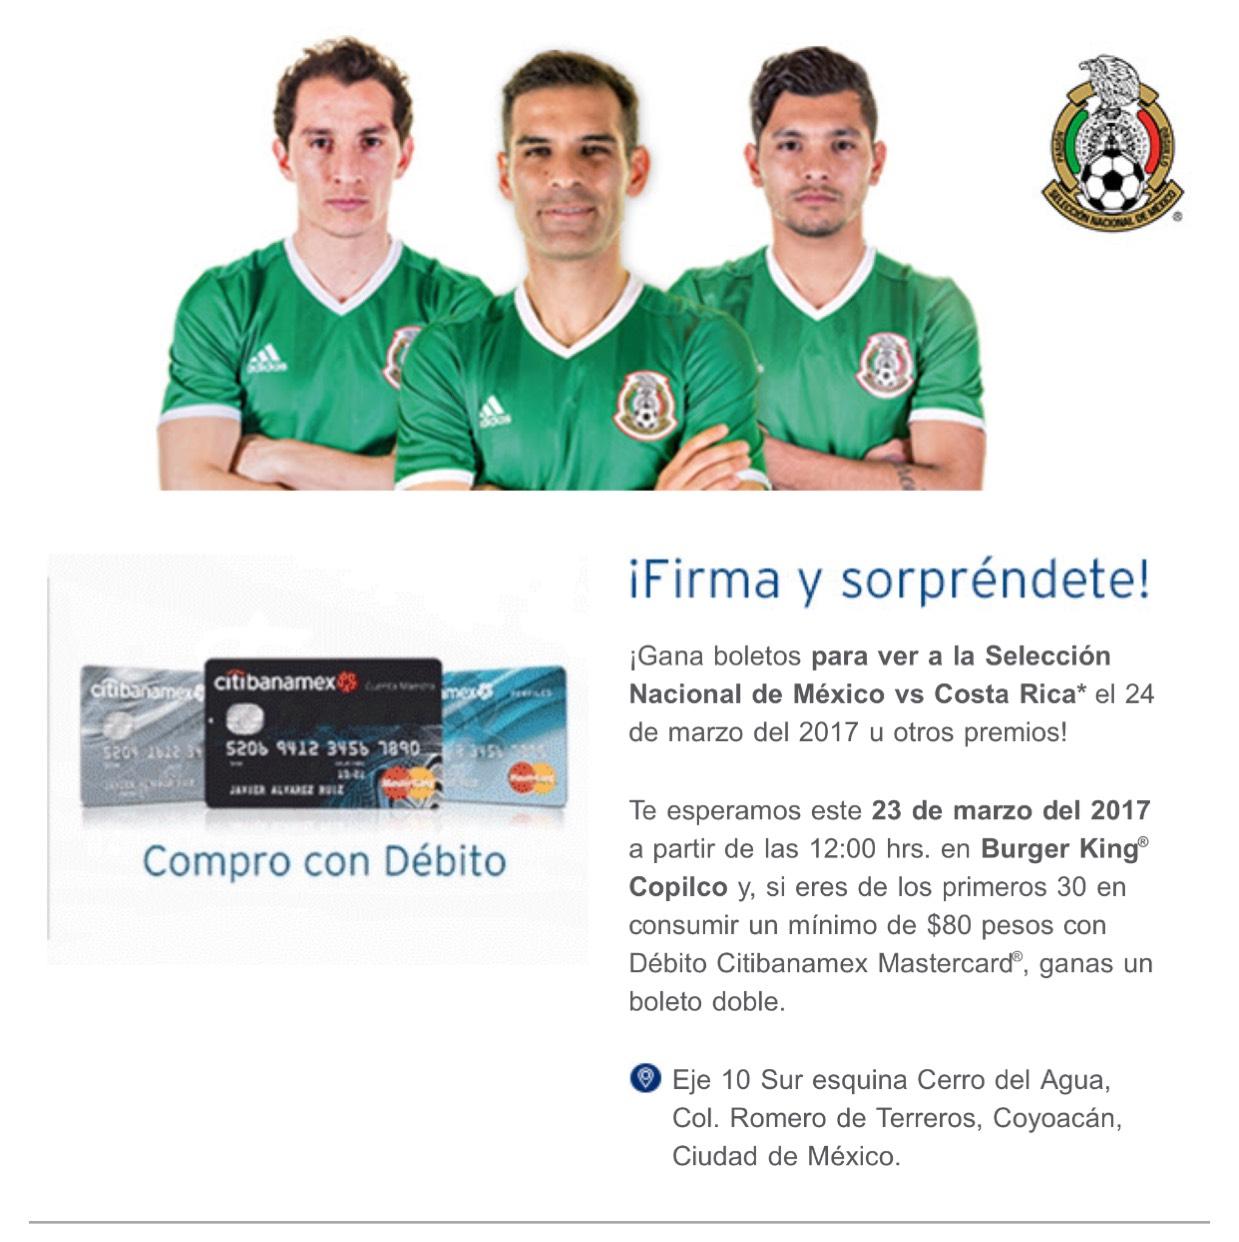 2 boletos gratis México vs Costa Rica pagando más de $80 con débito Banamex en Burger King Copilco CDMX